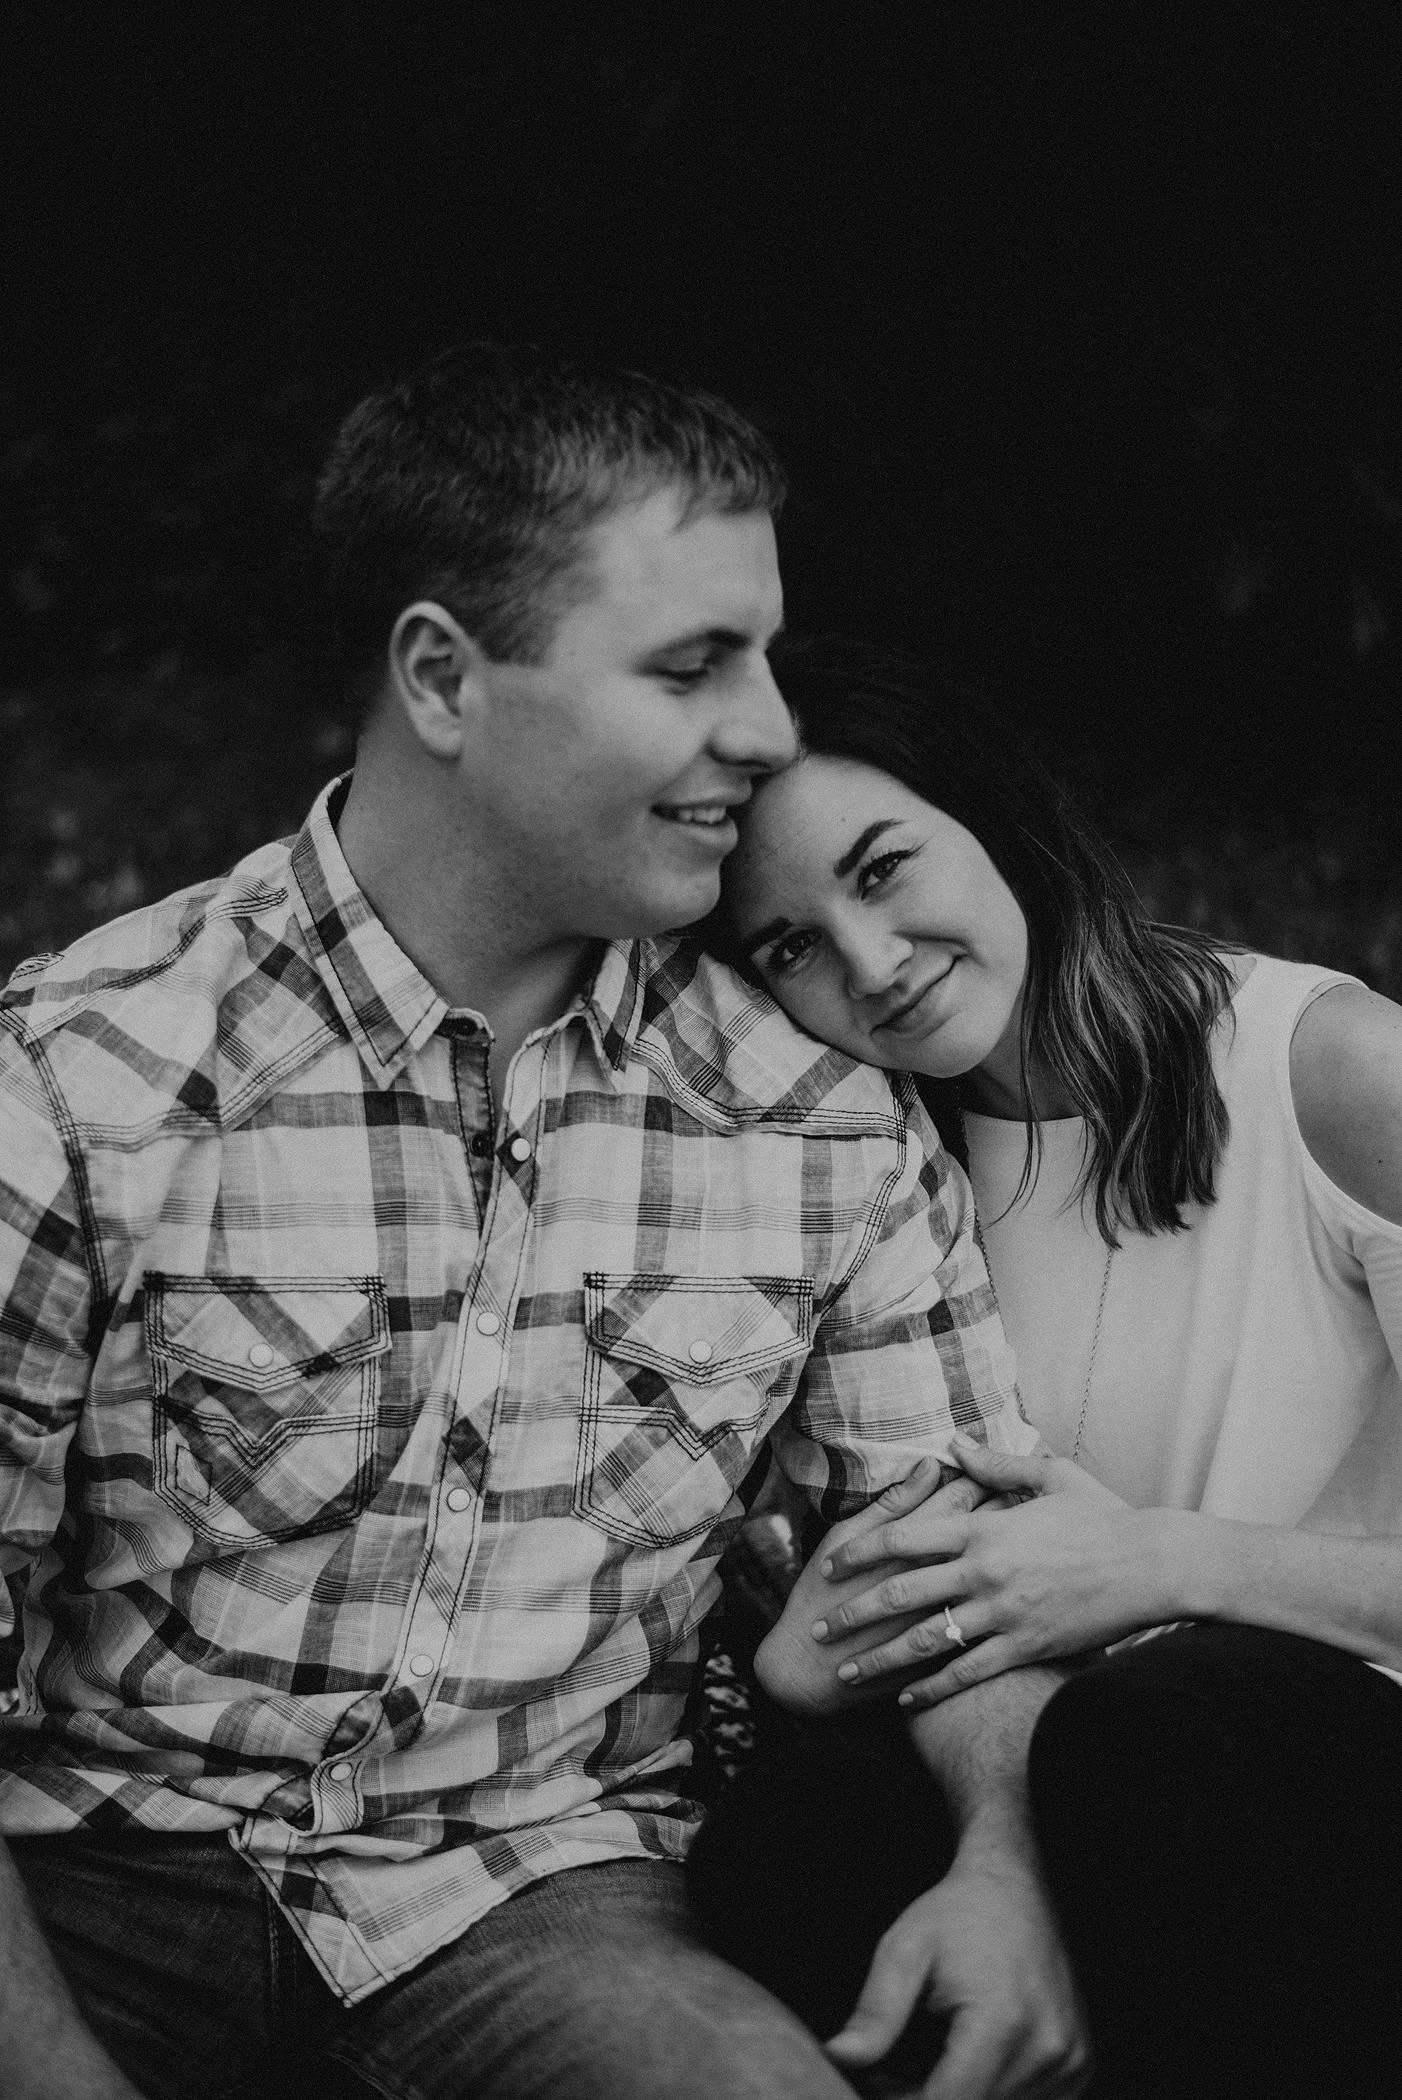 kaylie-sirek-nebraska-wedding-engagement-photographer-photography-grand-island-kearney-hastings-lincoln-54.png